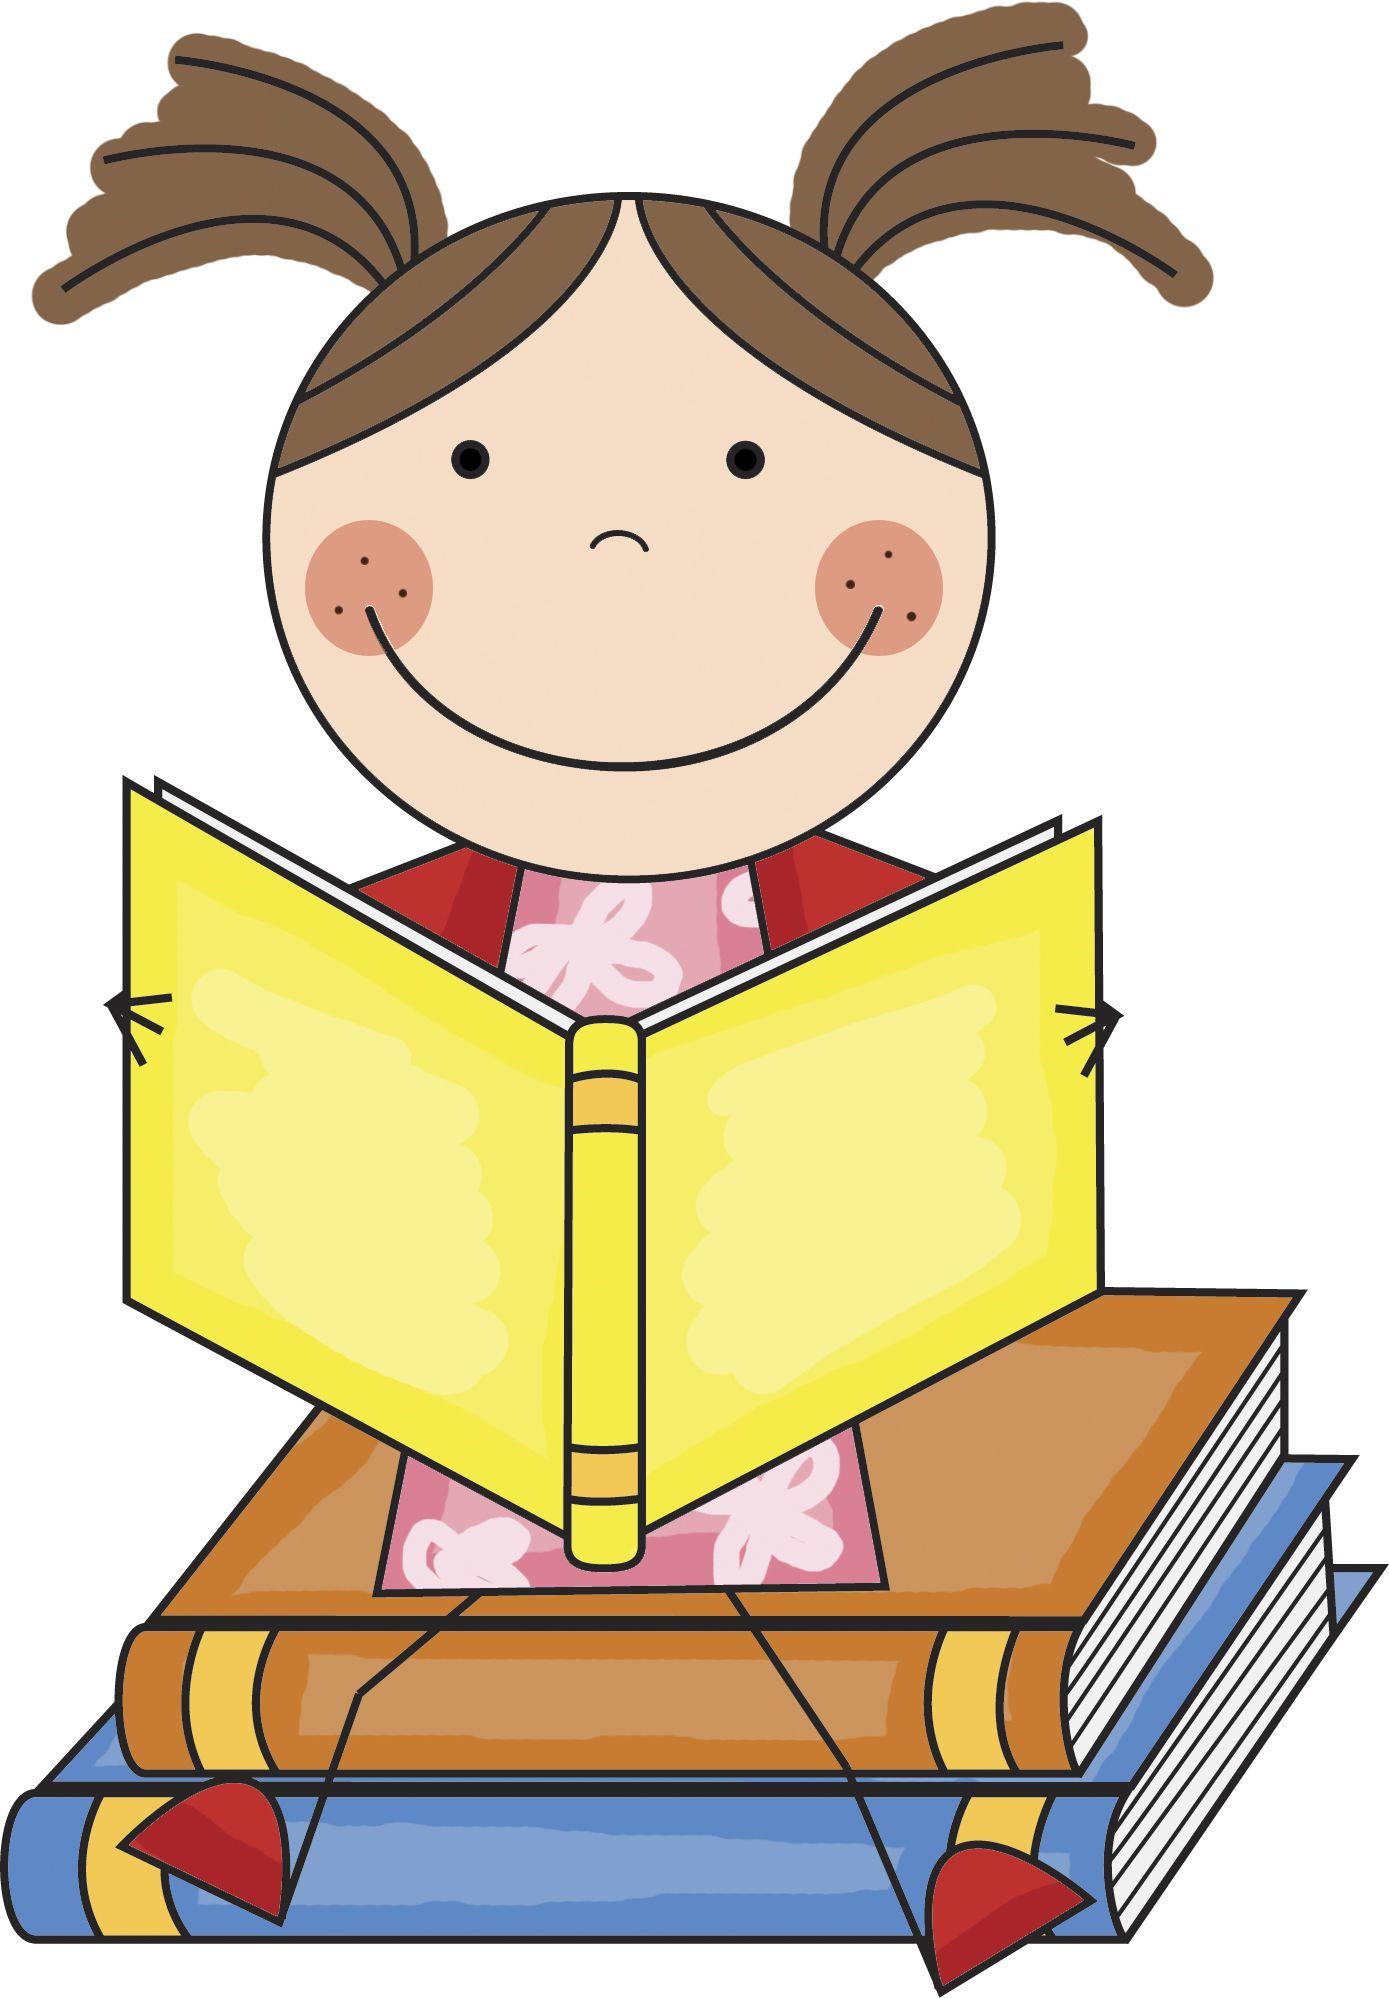 girl reading clip art | reading centers | ღ❣kid's~stuff❣ღ